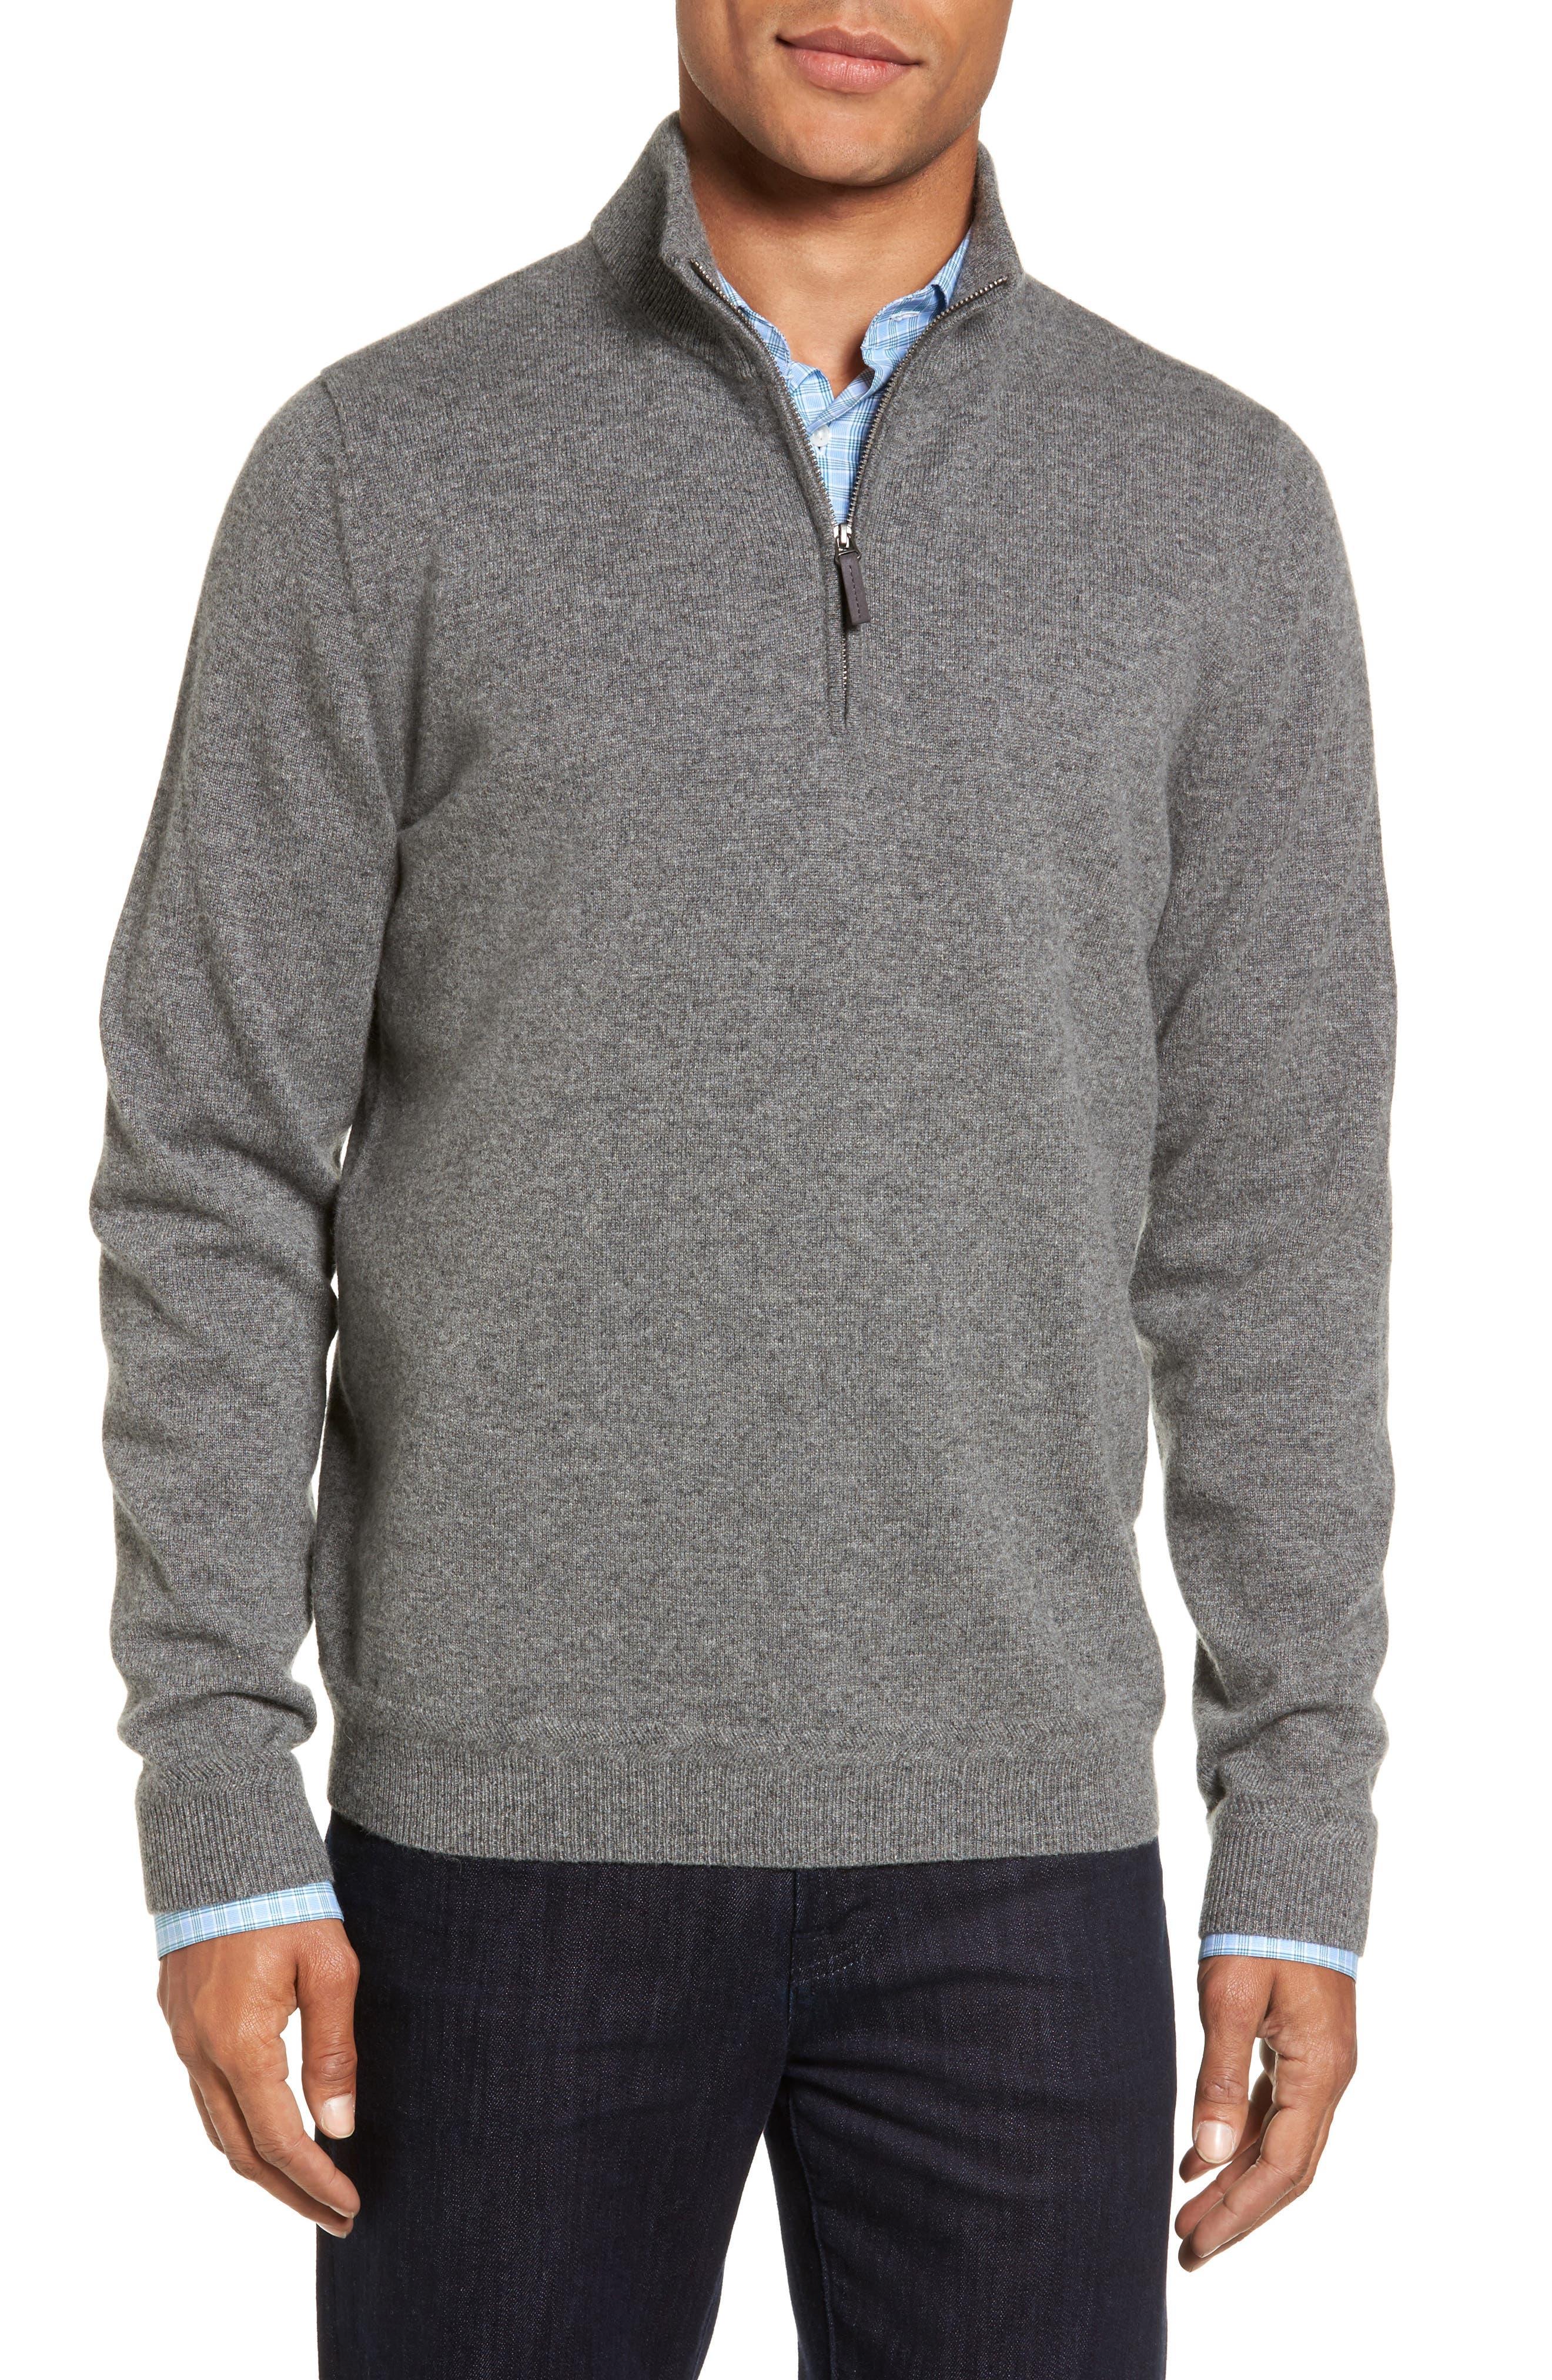 Alternate Image 1 Selected - John W. Nordstrom® Quarter Zip Cashmere Sweater (Regular & Tall)